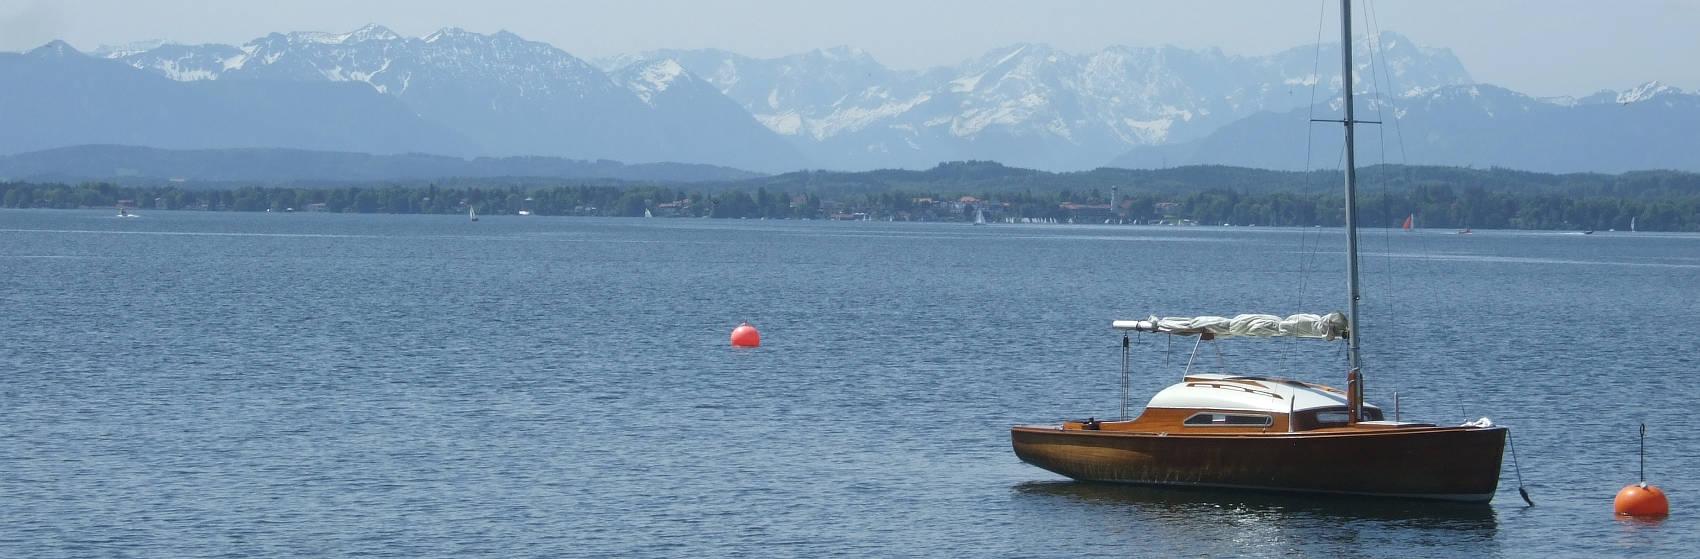 Münsing am Starnberger See